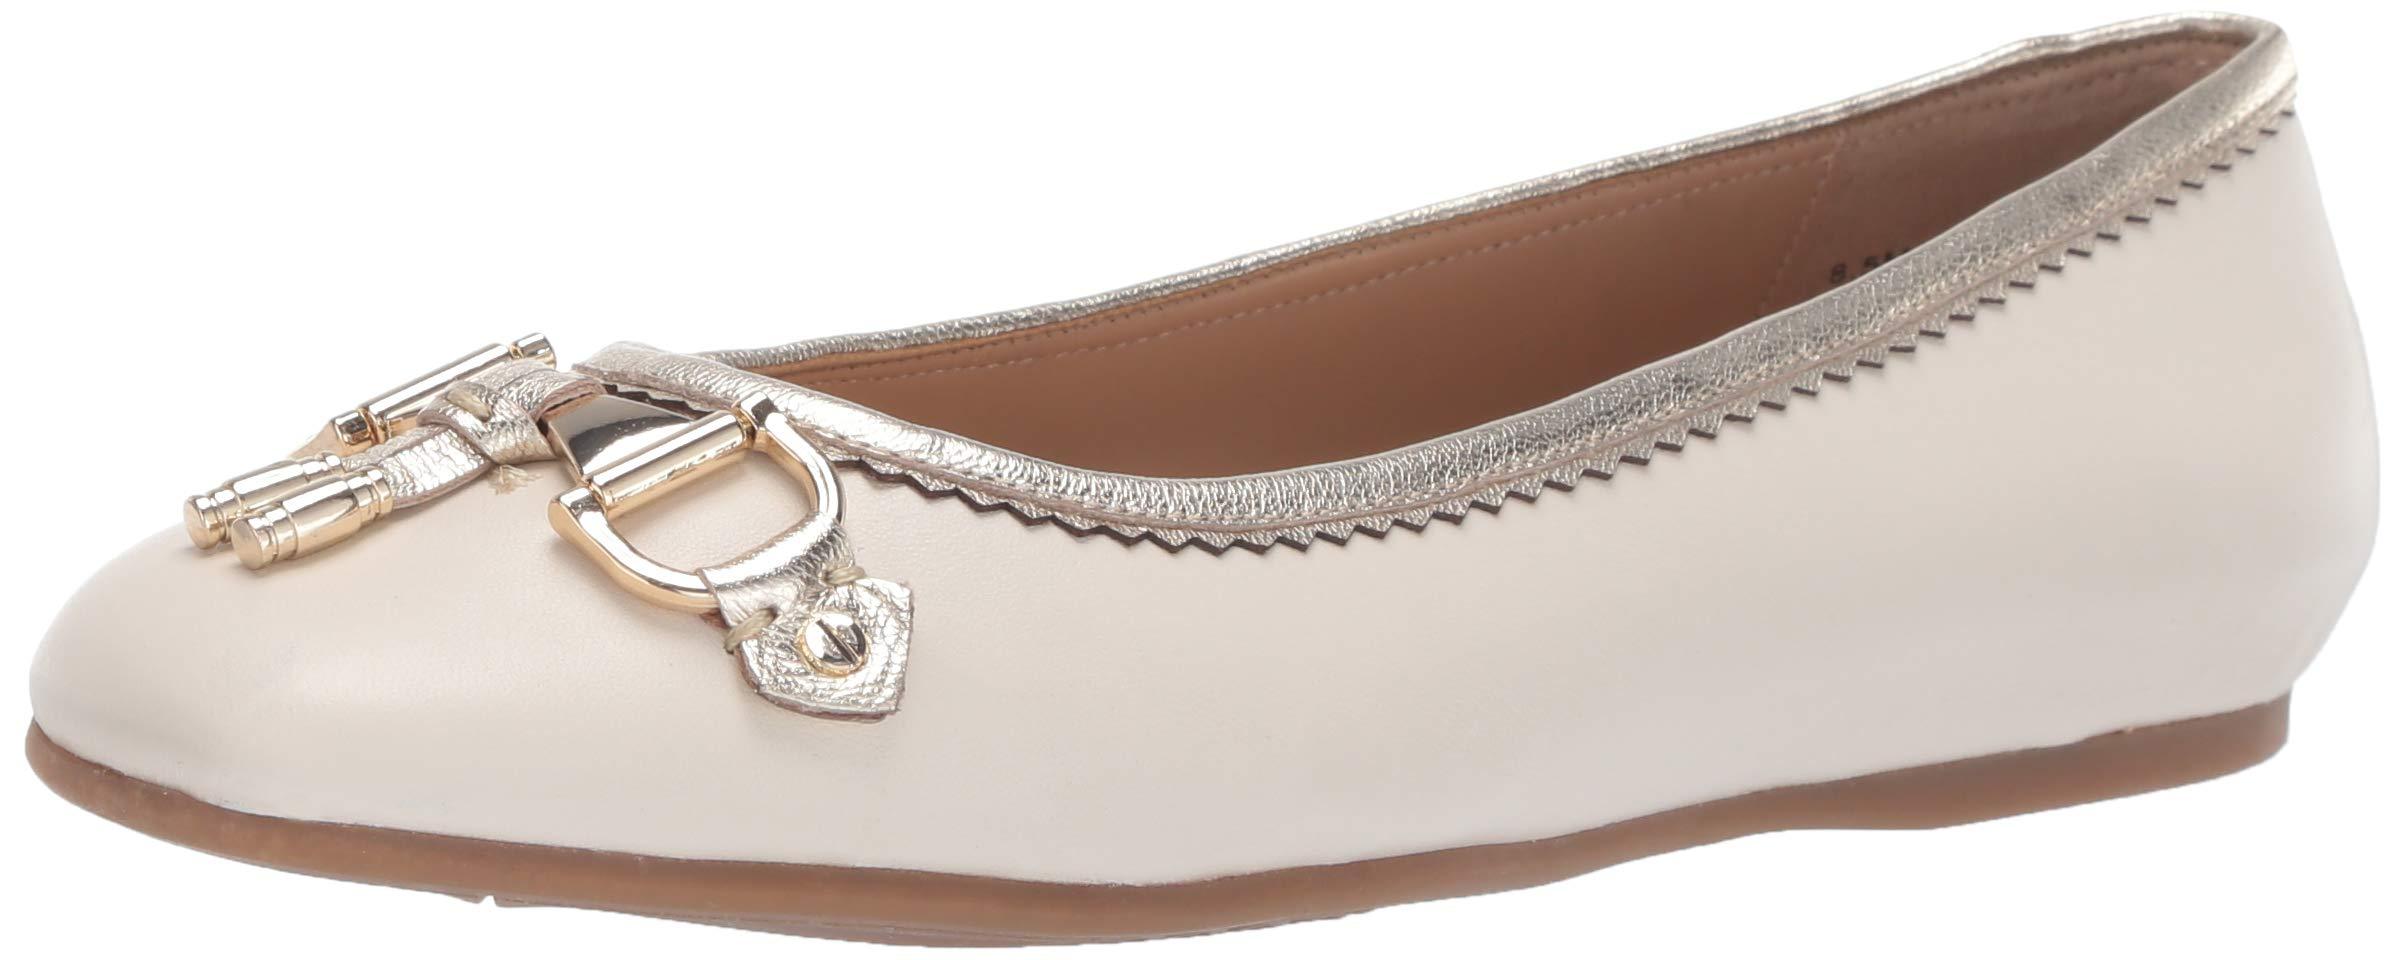 Aerosoles Women's Mint Julep Shoe, Bone Leather, 5 M US by Aerosoles